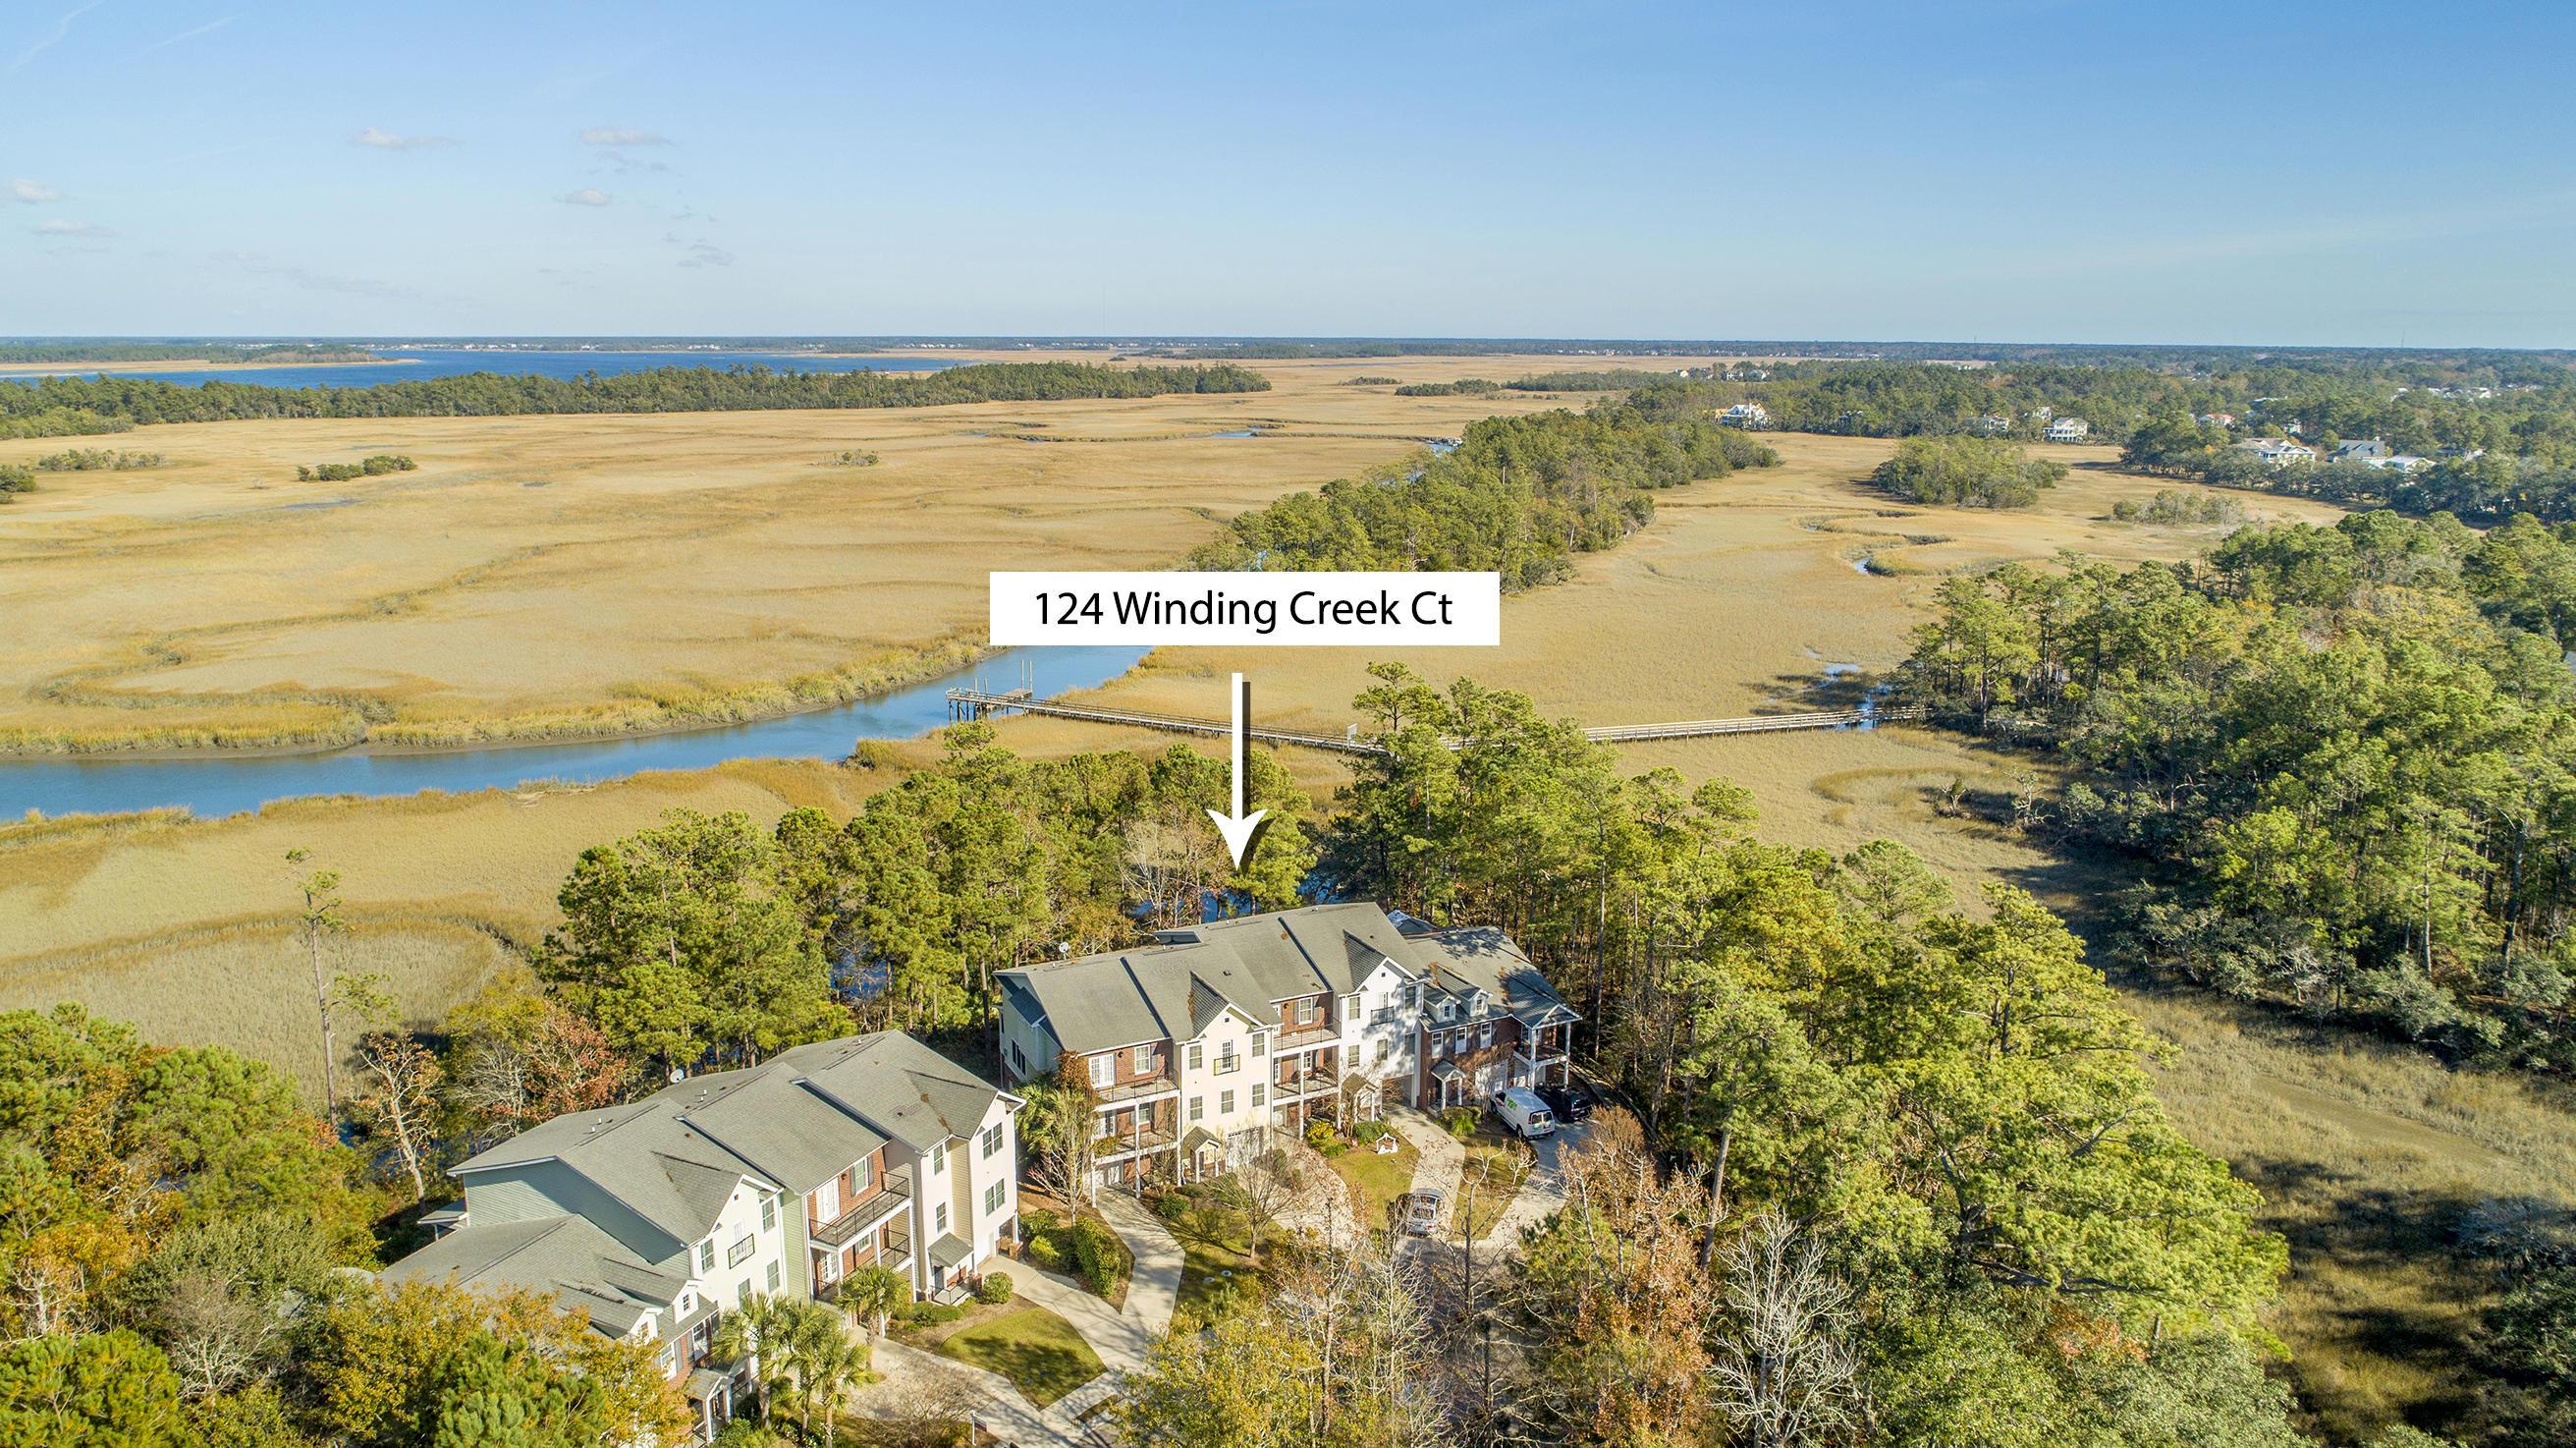 Etiwan Pointe Homes For Sale - 124 Winding Creek, Mount Pleasant, SC - 2